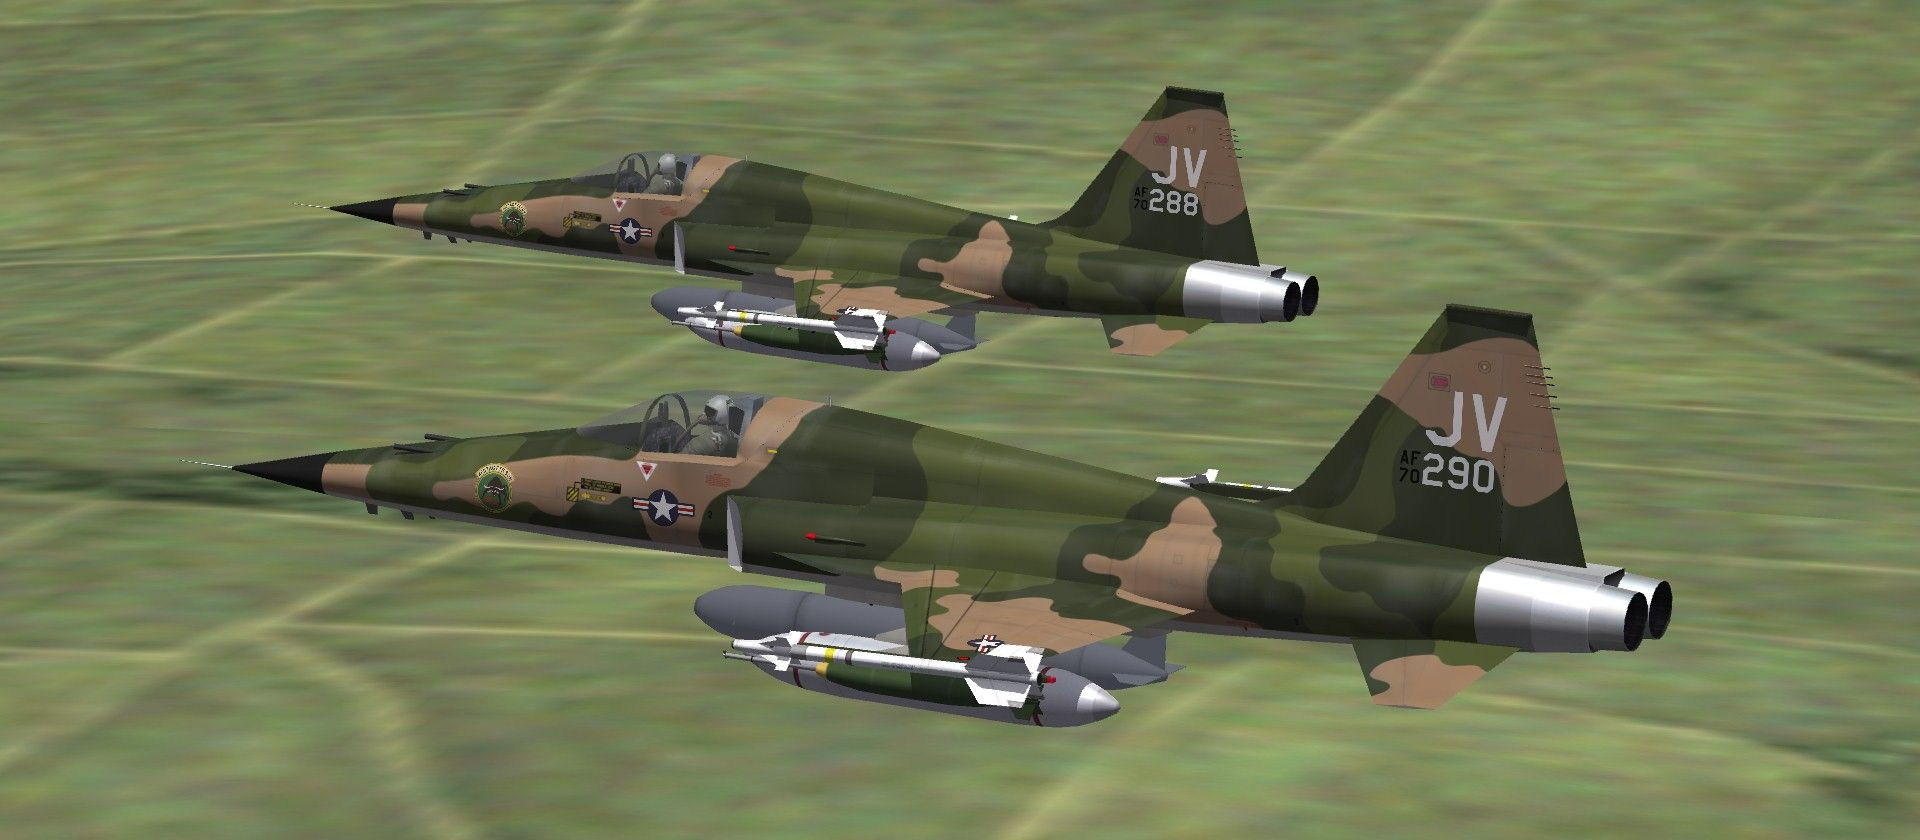 USAFF-5ESKOSHITIGER02_zps140125df.jpg